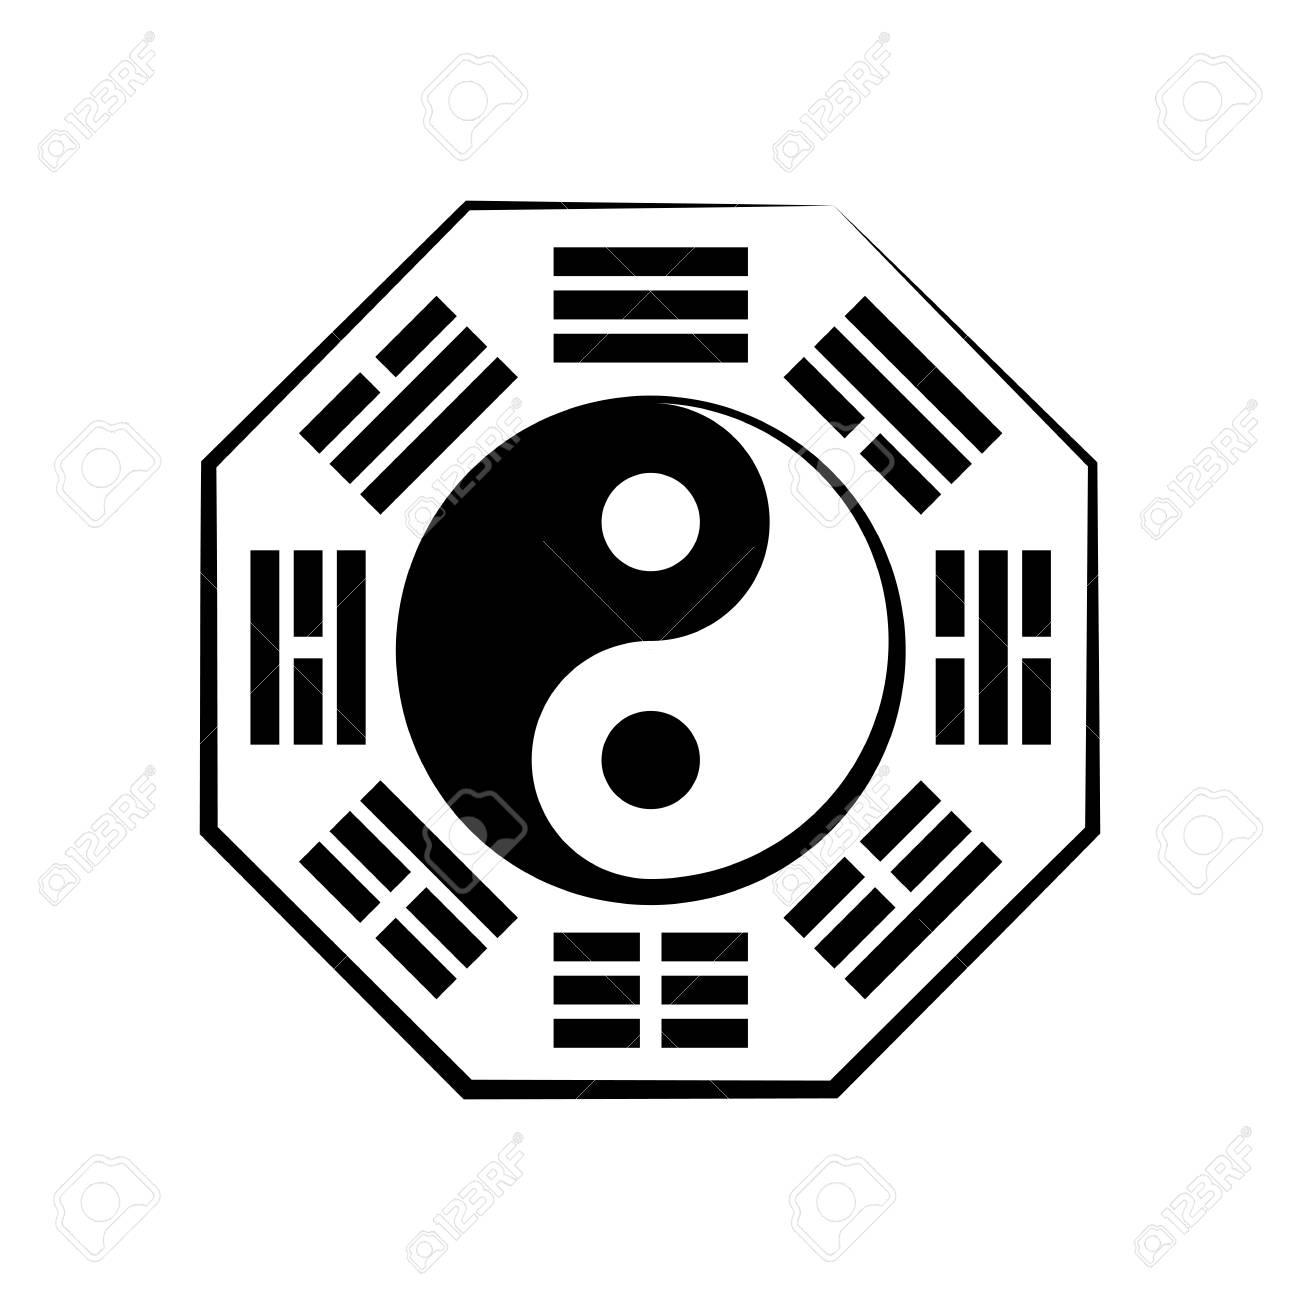 Yin Yang And B Gu 8 Trigrams The Chinese Cosmic Symbol Of